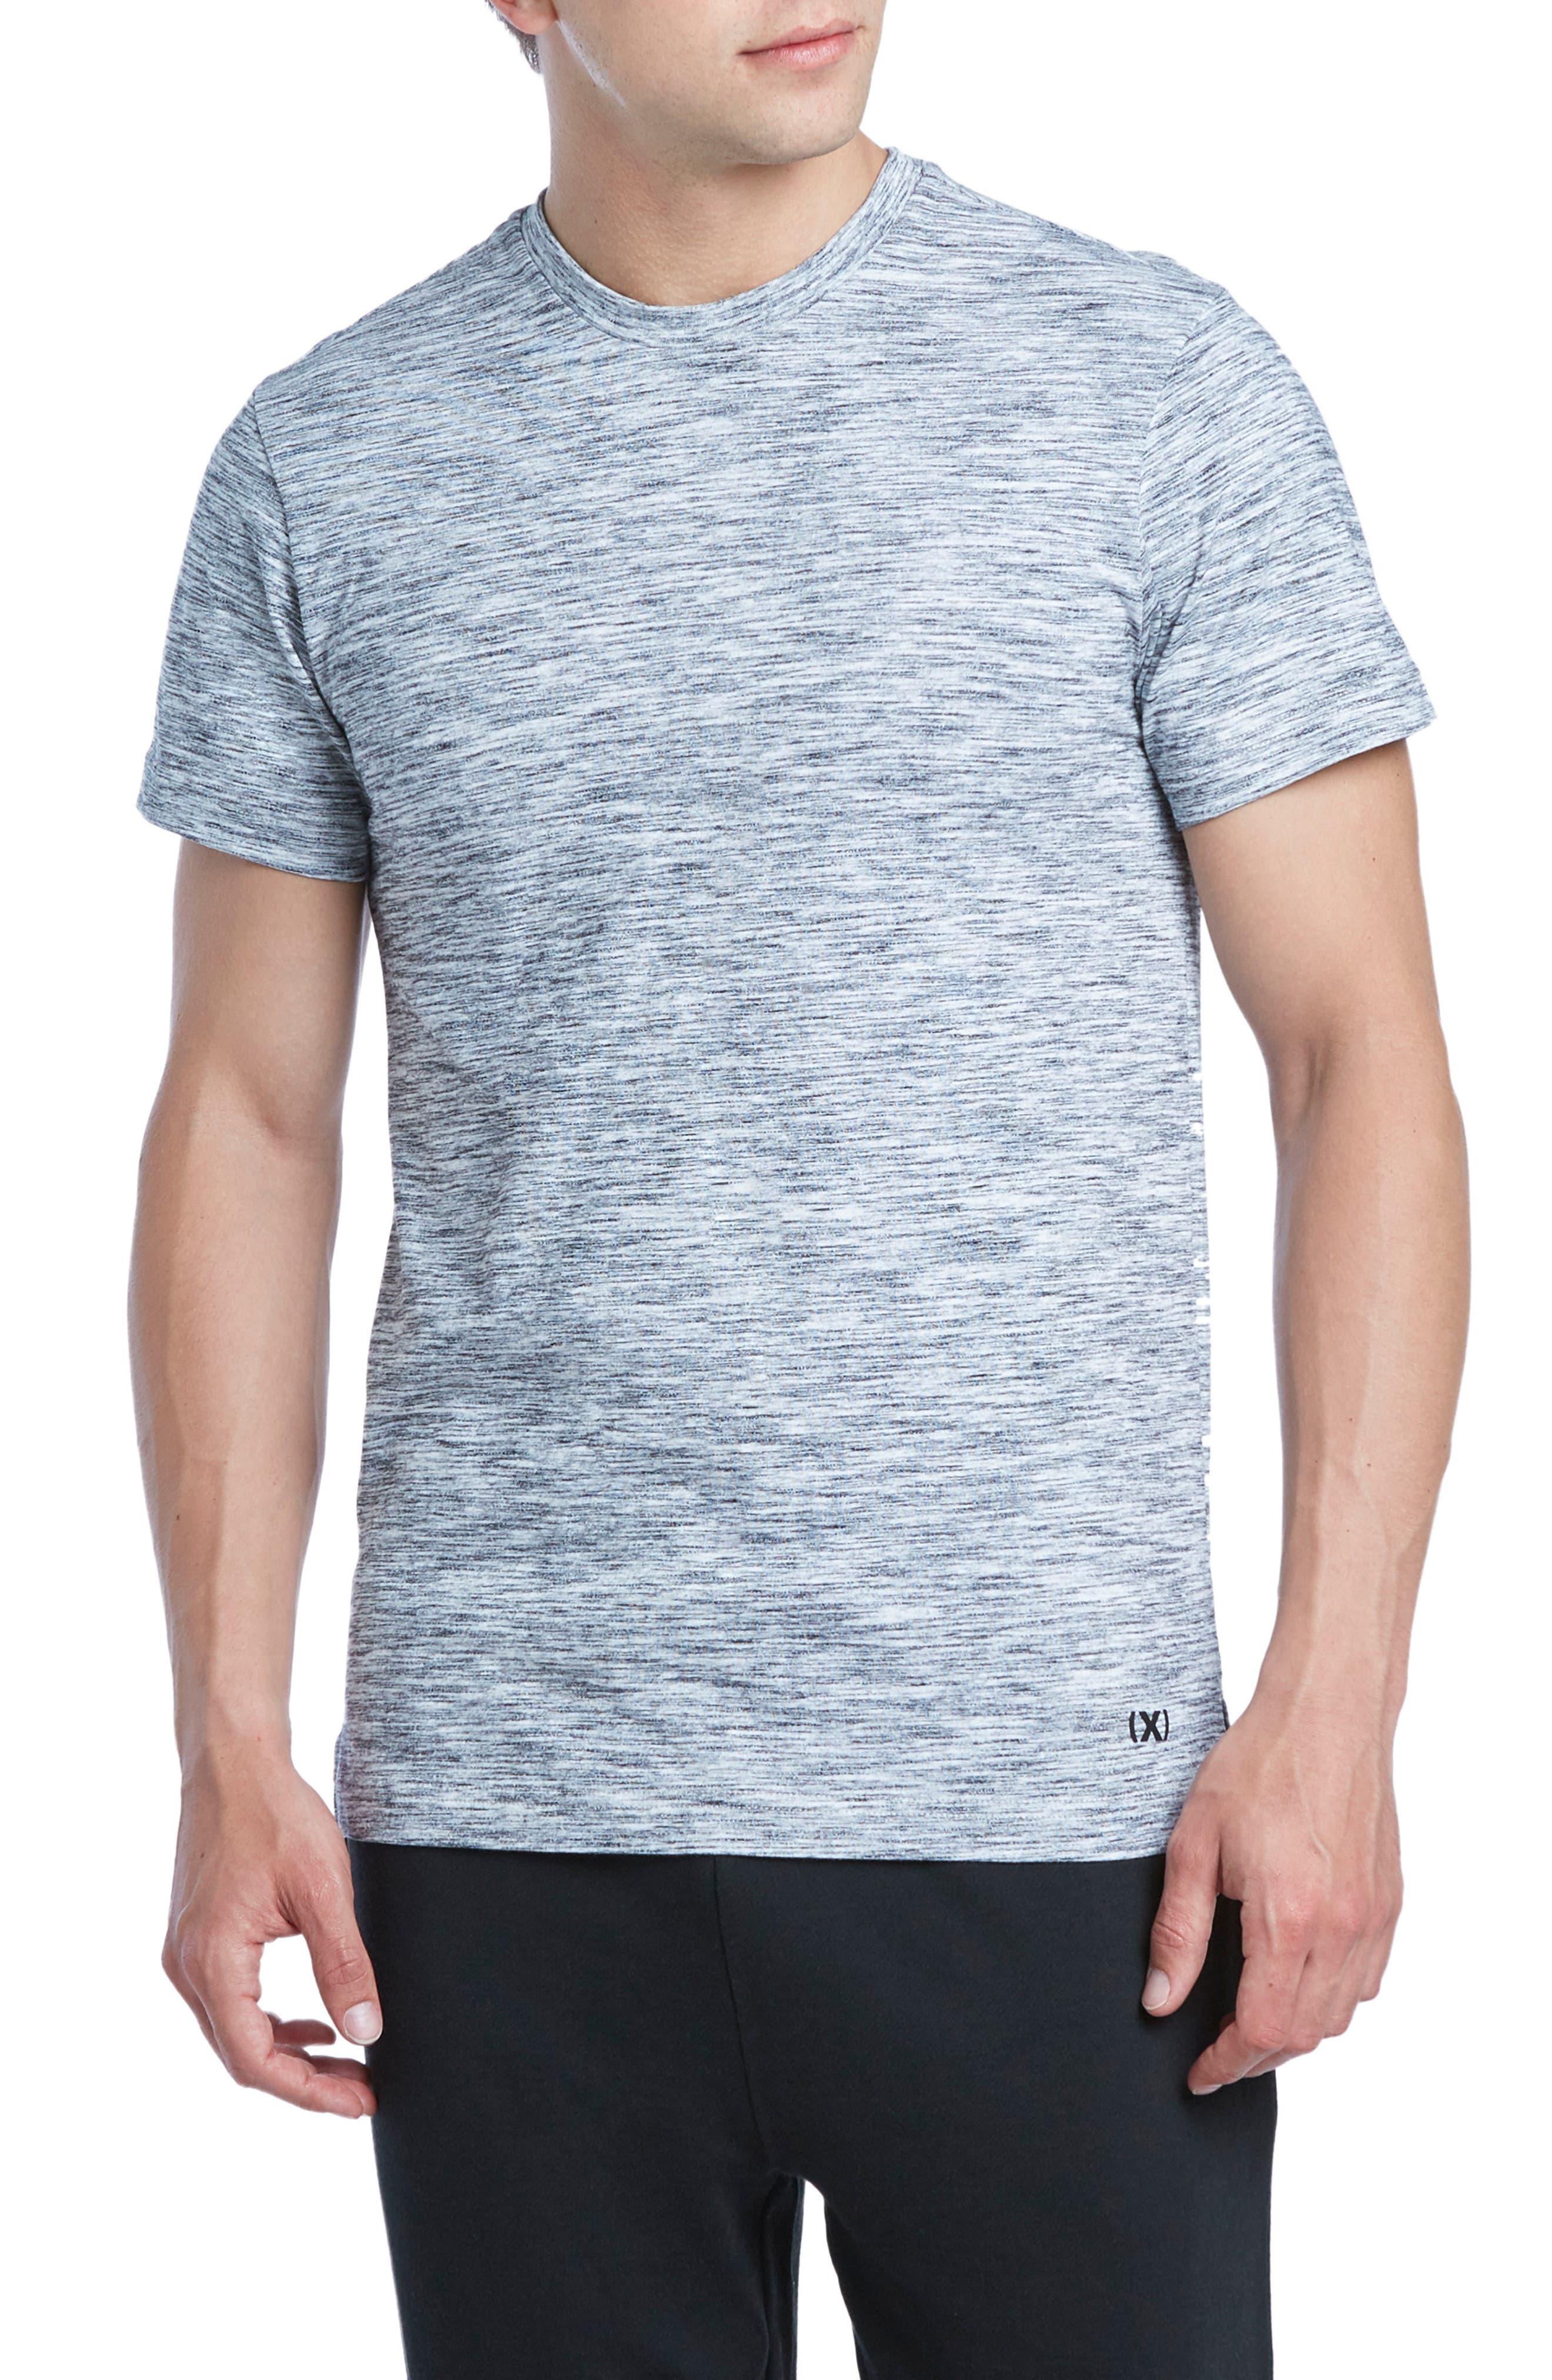 Static Crewneck Cotton T-Shirt,                             Main thumbnail 1, color,                             Black/ White